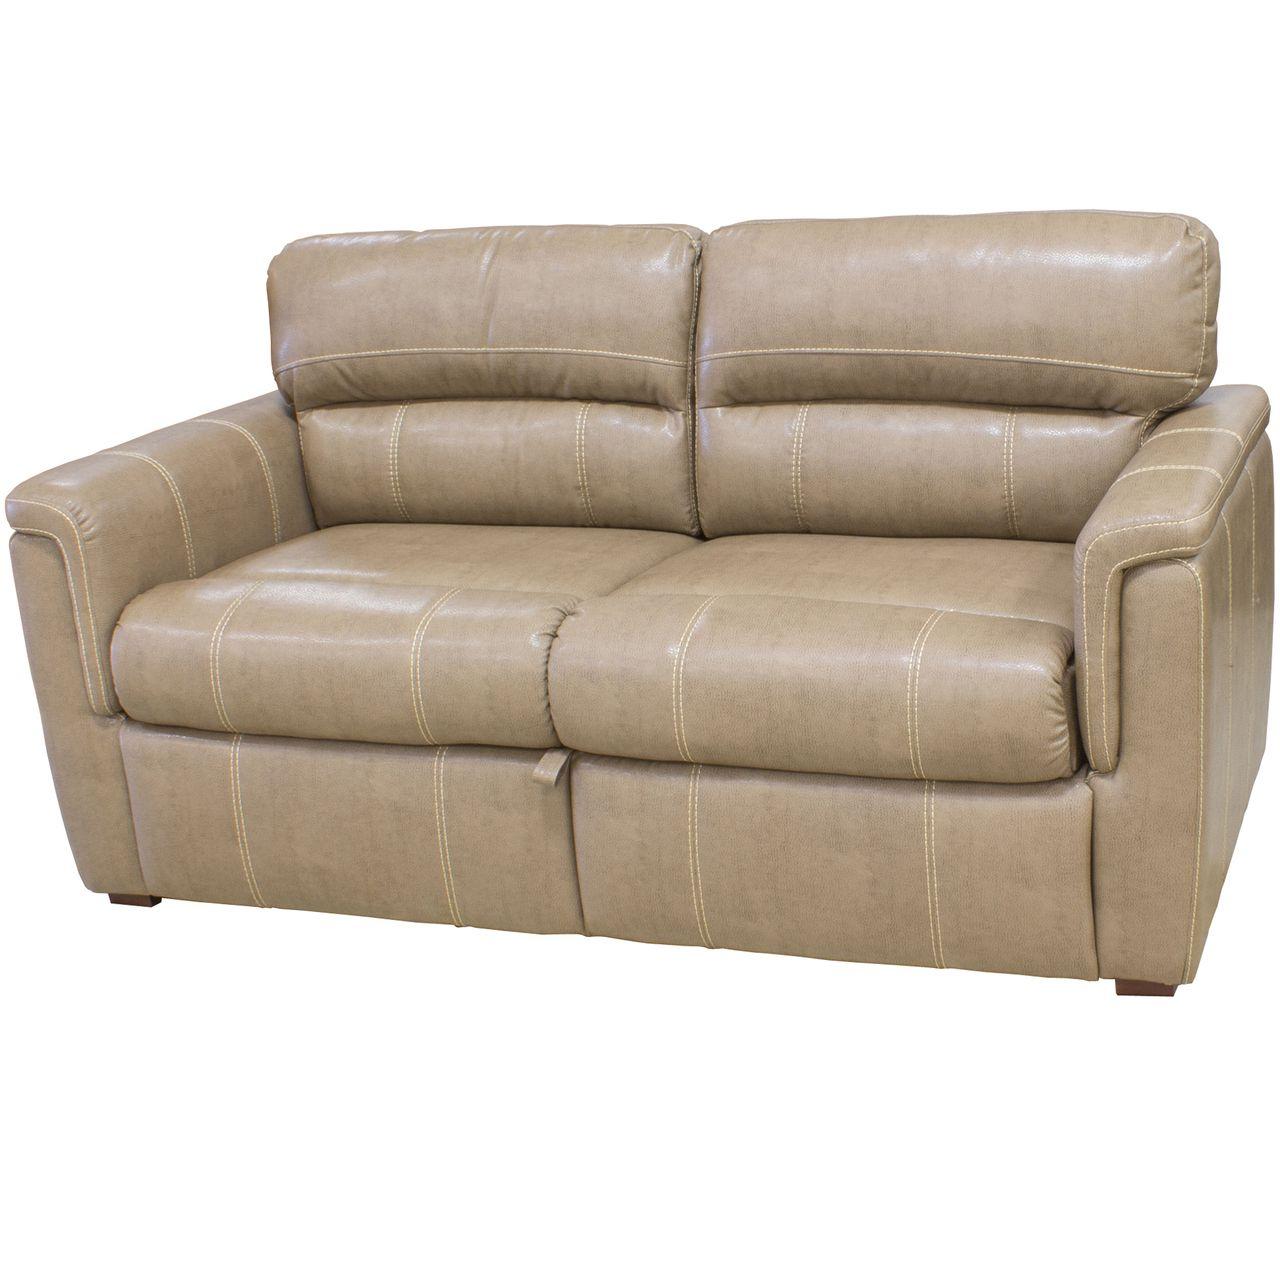 70 Rambler Doe Rv Tri Fold Sofa Rv Parts Nation Rv Sofa Rv